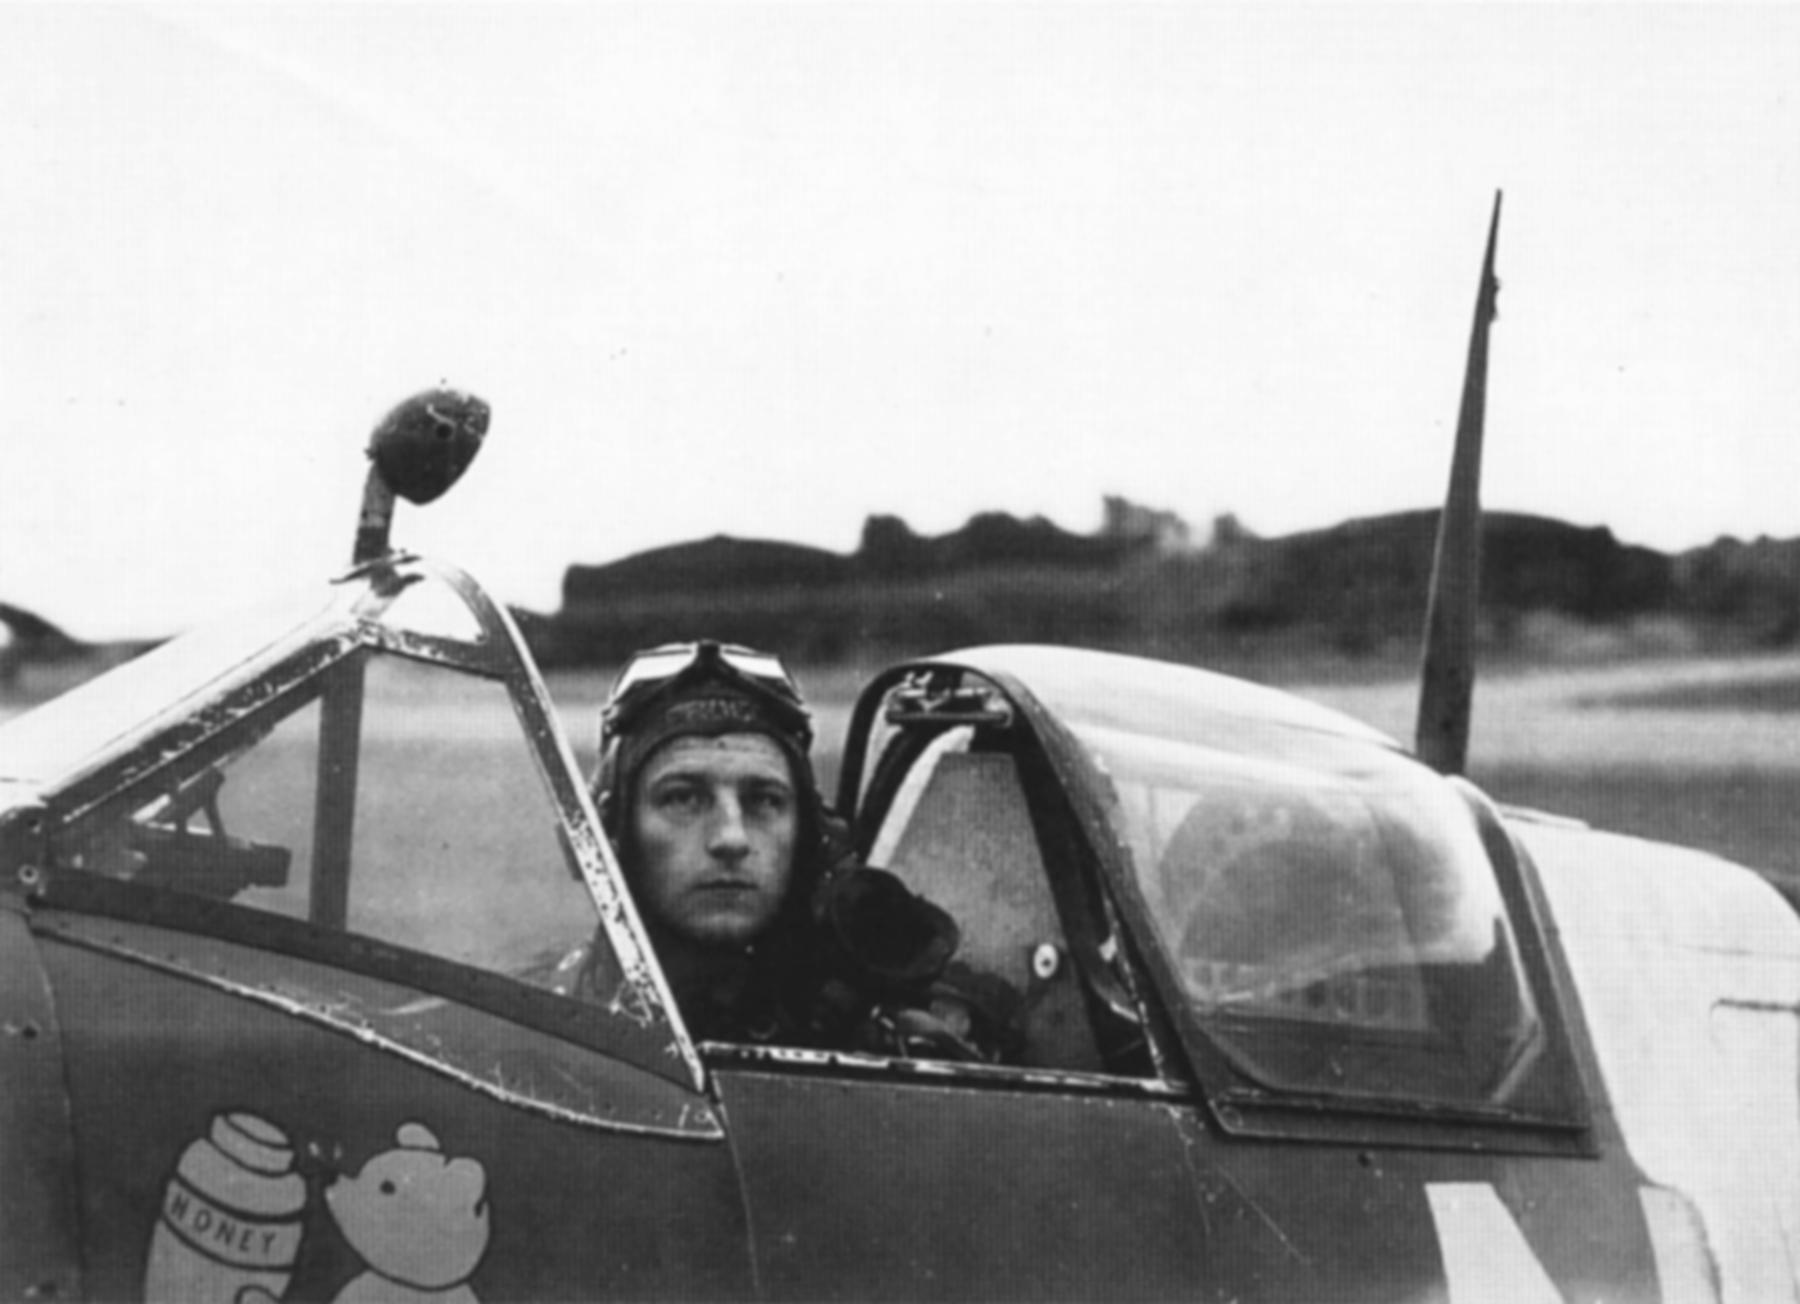 Spitfire MkIXc RAAF 453Sqn FUN Lyall MH454 England 1944 01